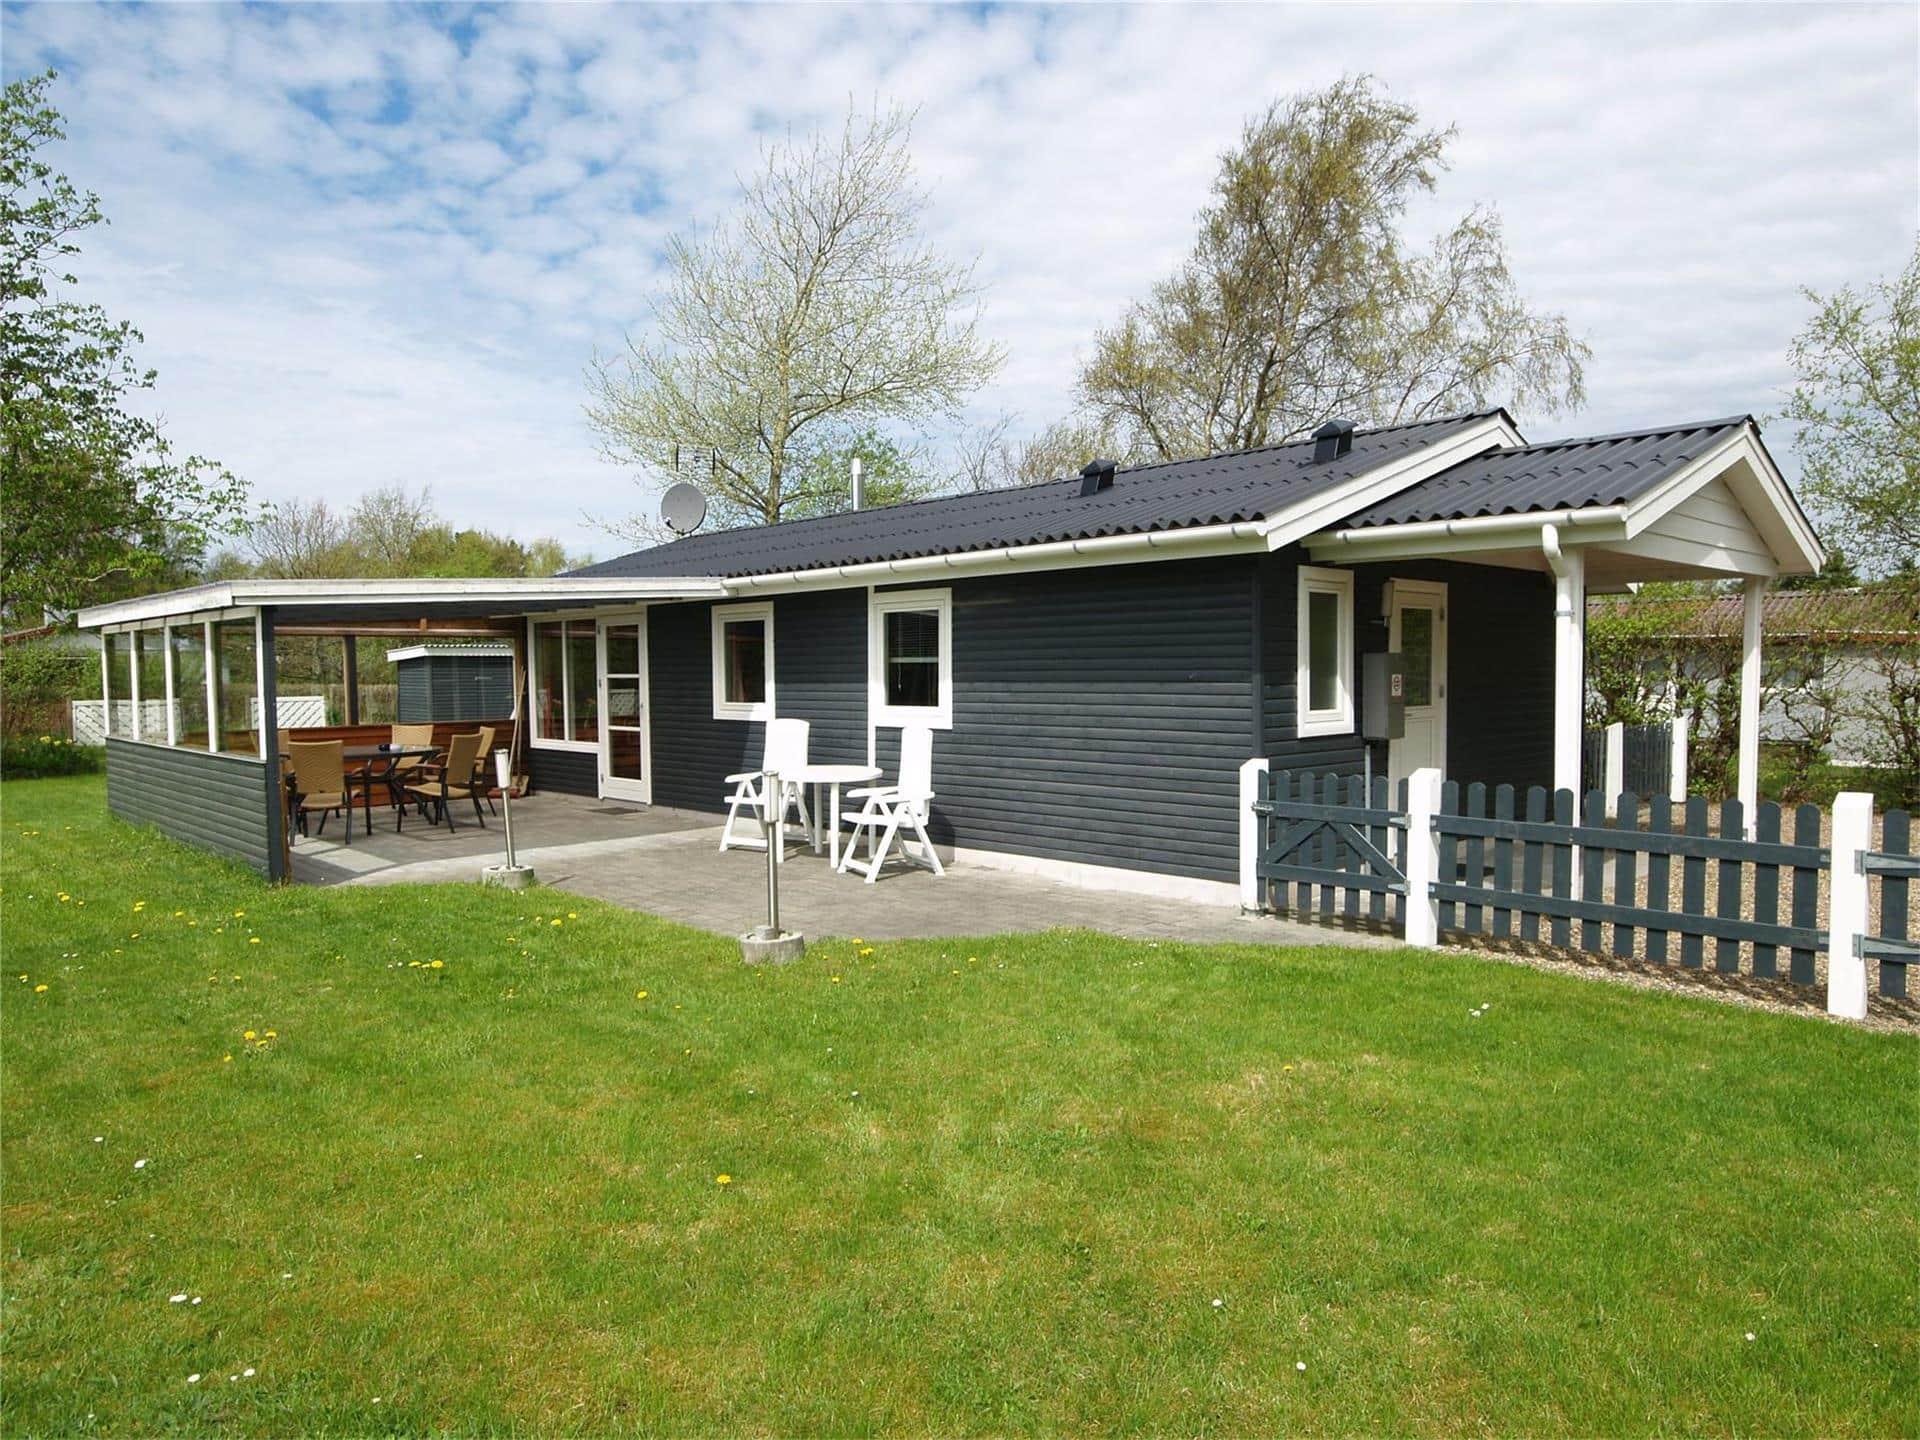 Billede 1-22 Sommerhus C11113, Linningvej 26, DK - 6893 Hemmet